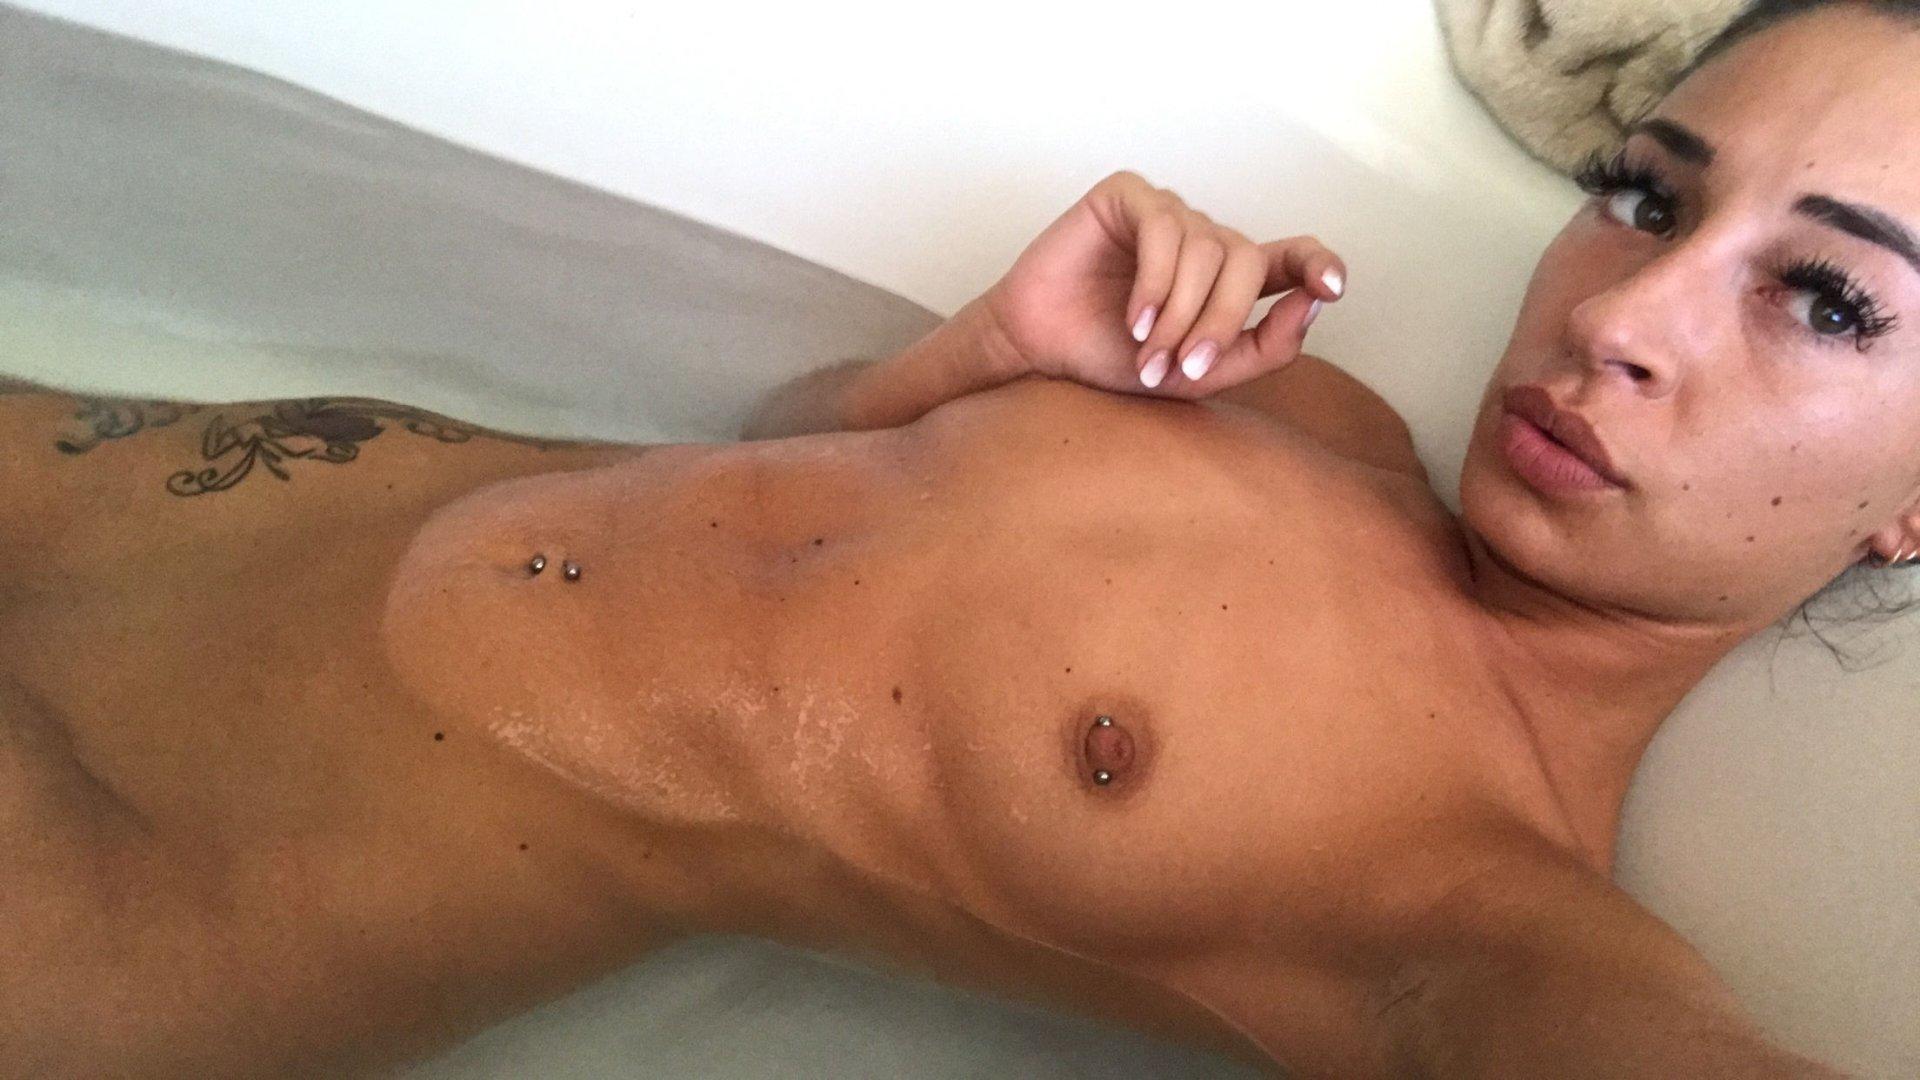 Cameron-Canela-Naked-TheFappeningBlog.com-25.jpg